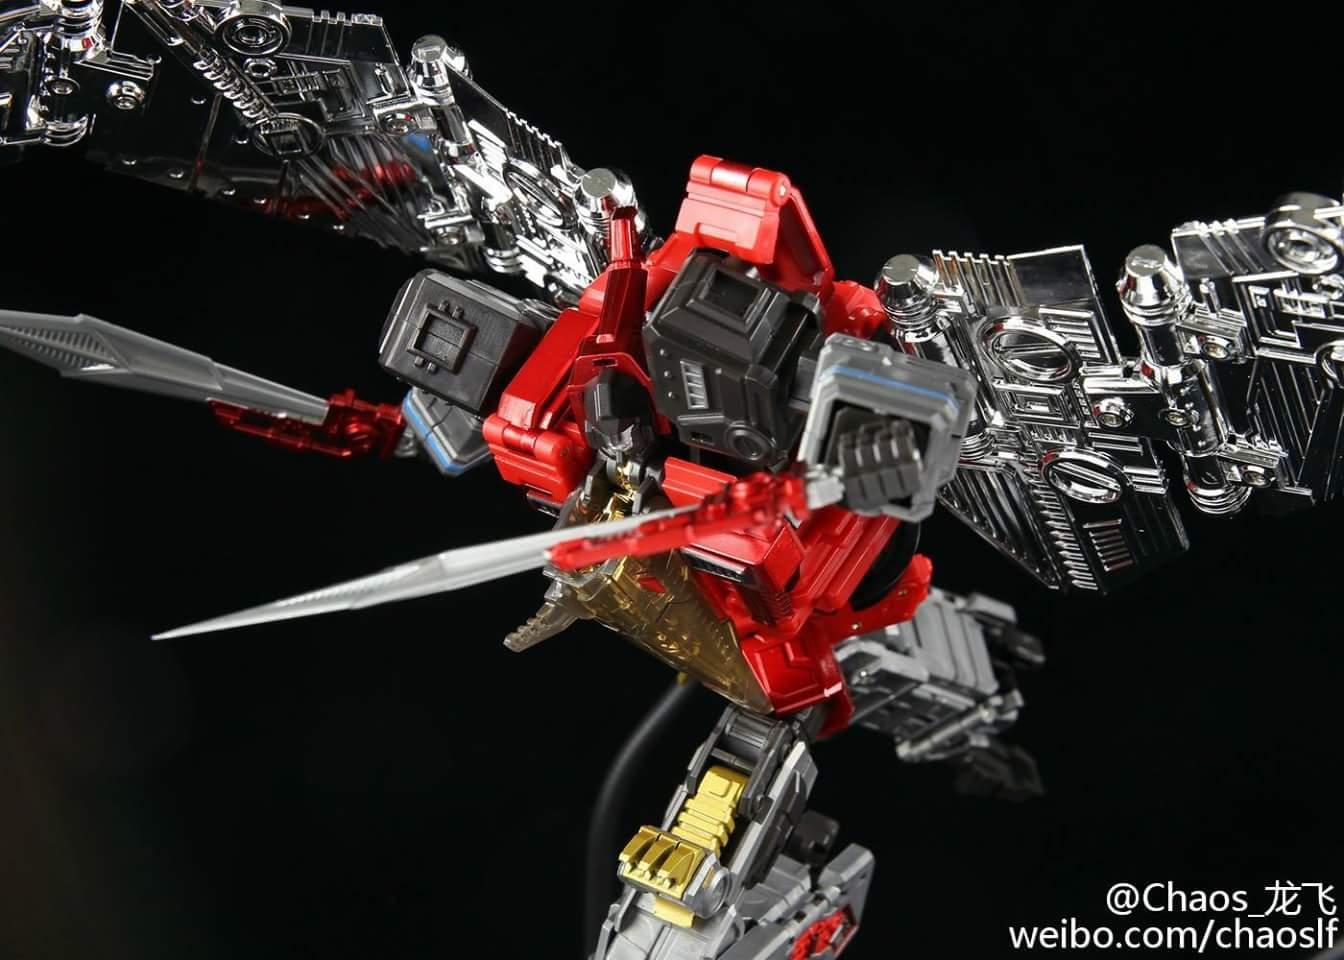 [GCreation] Produit Tiers - Jouet ShuraKing - aka Combiner Dinobots - Page 5 2jI7IzXd